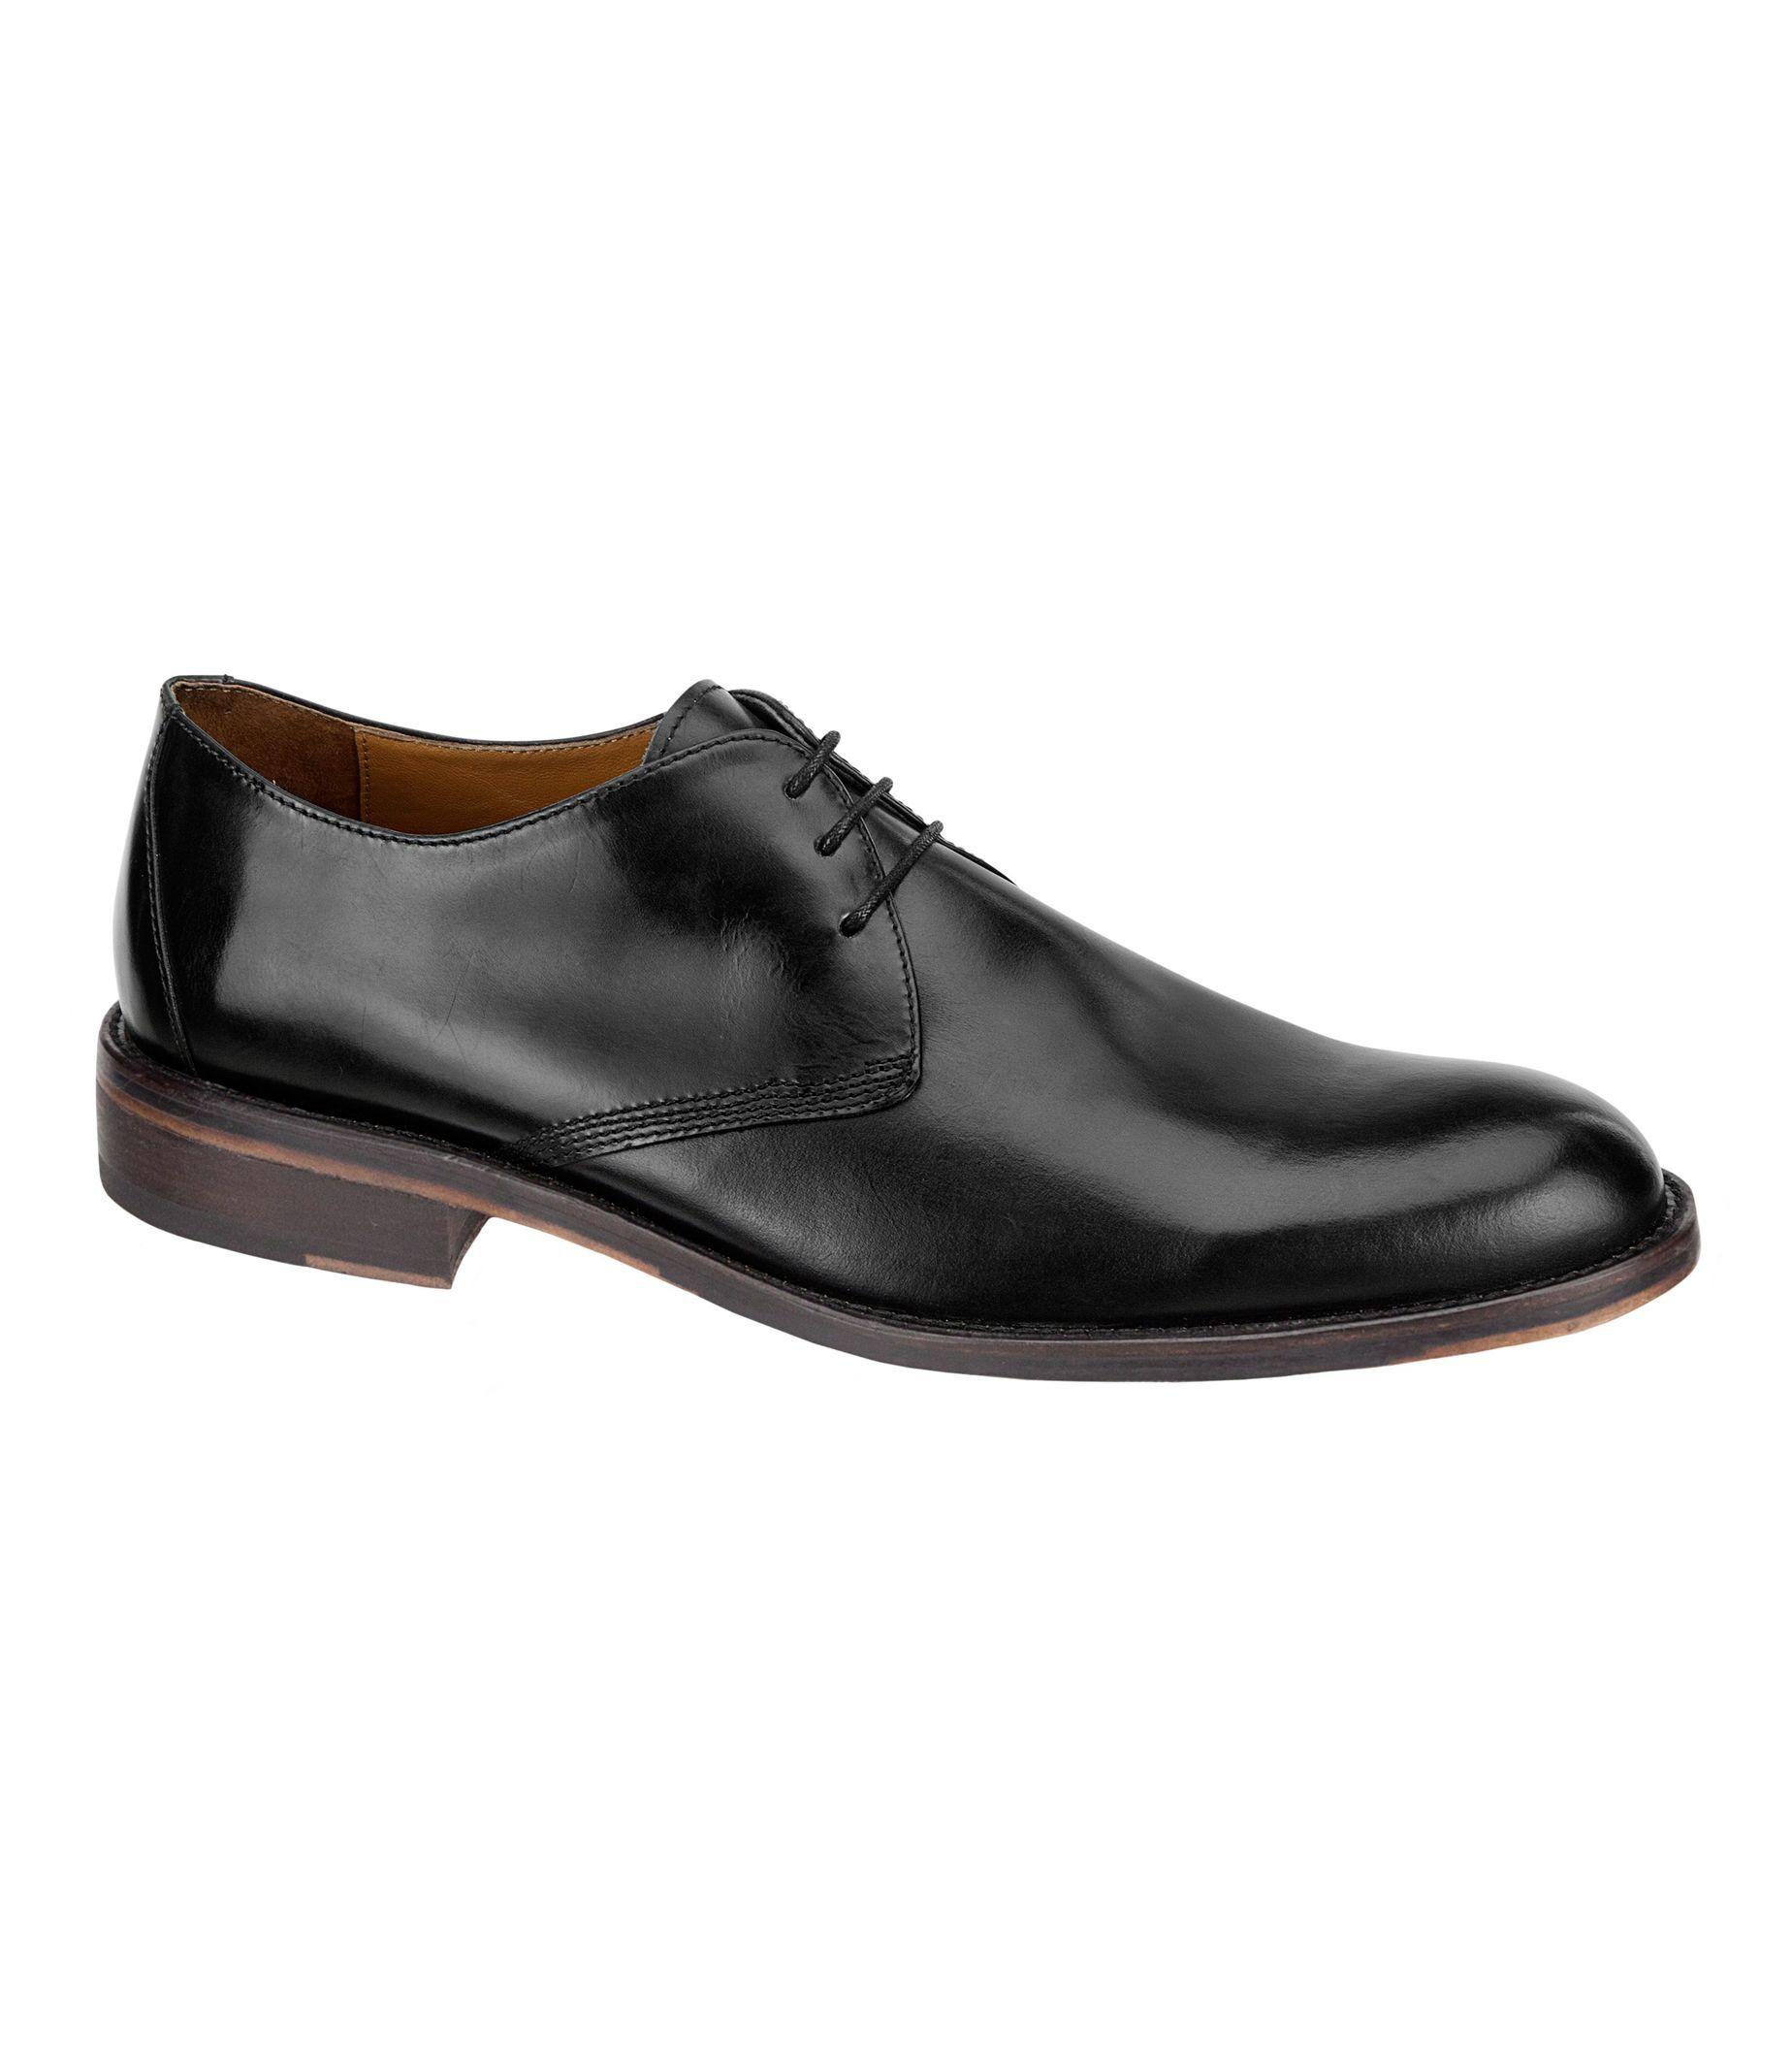 Hartley Plain Toe Shoe by Johnston & Murphy